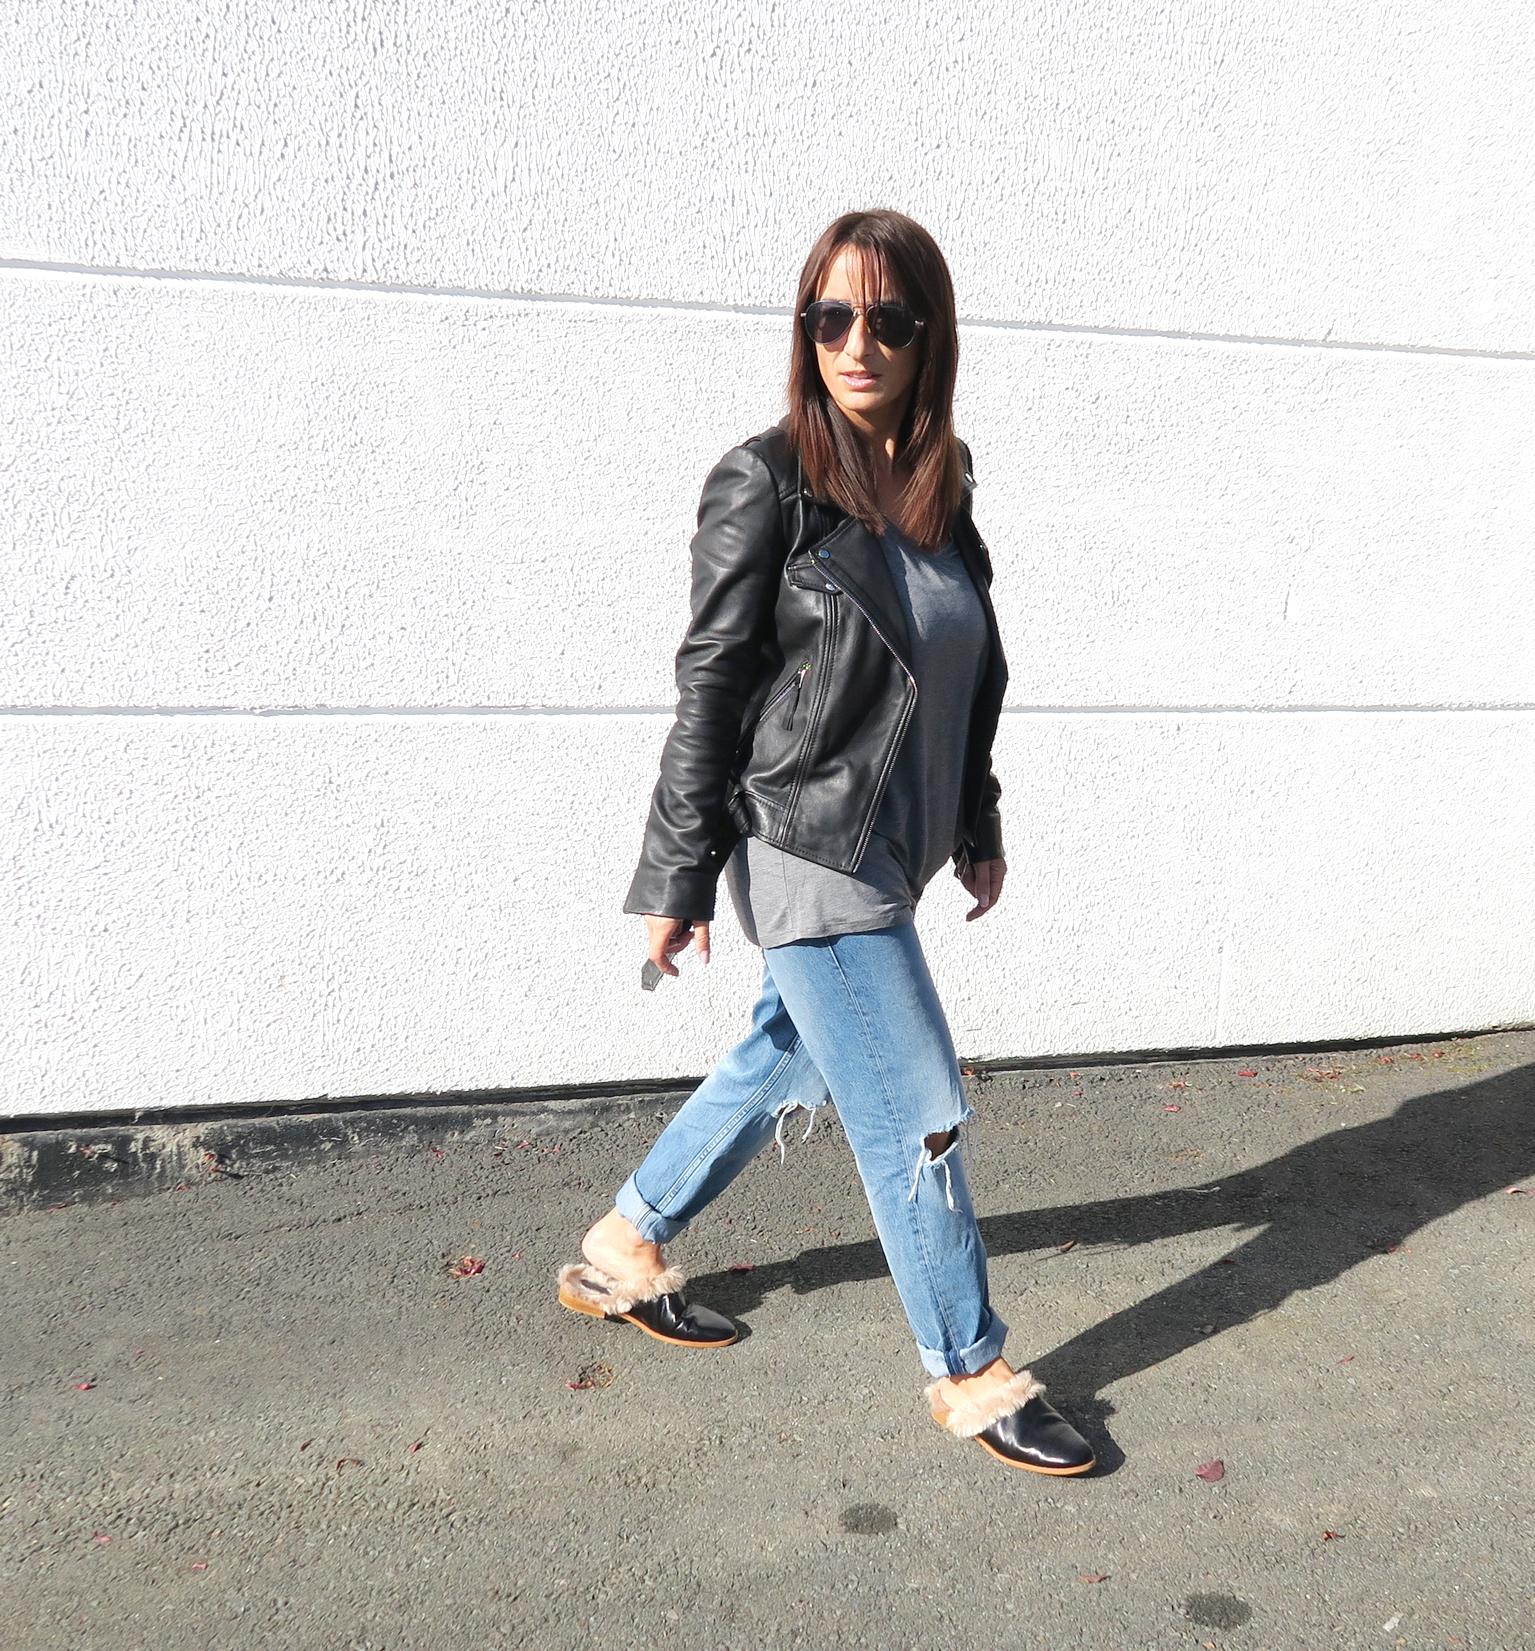 gucci-lookalike-flat-shoes-blogger-bloggerstyle-modesalat-1